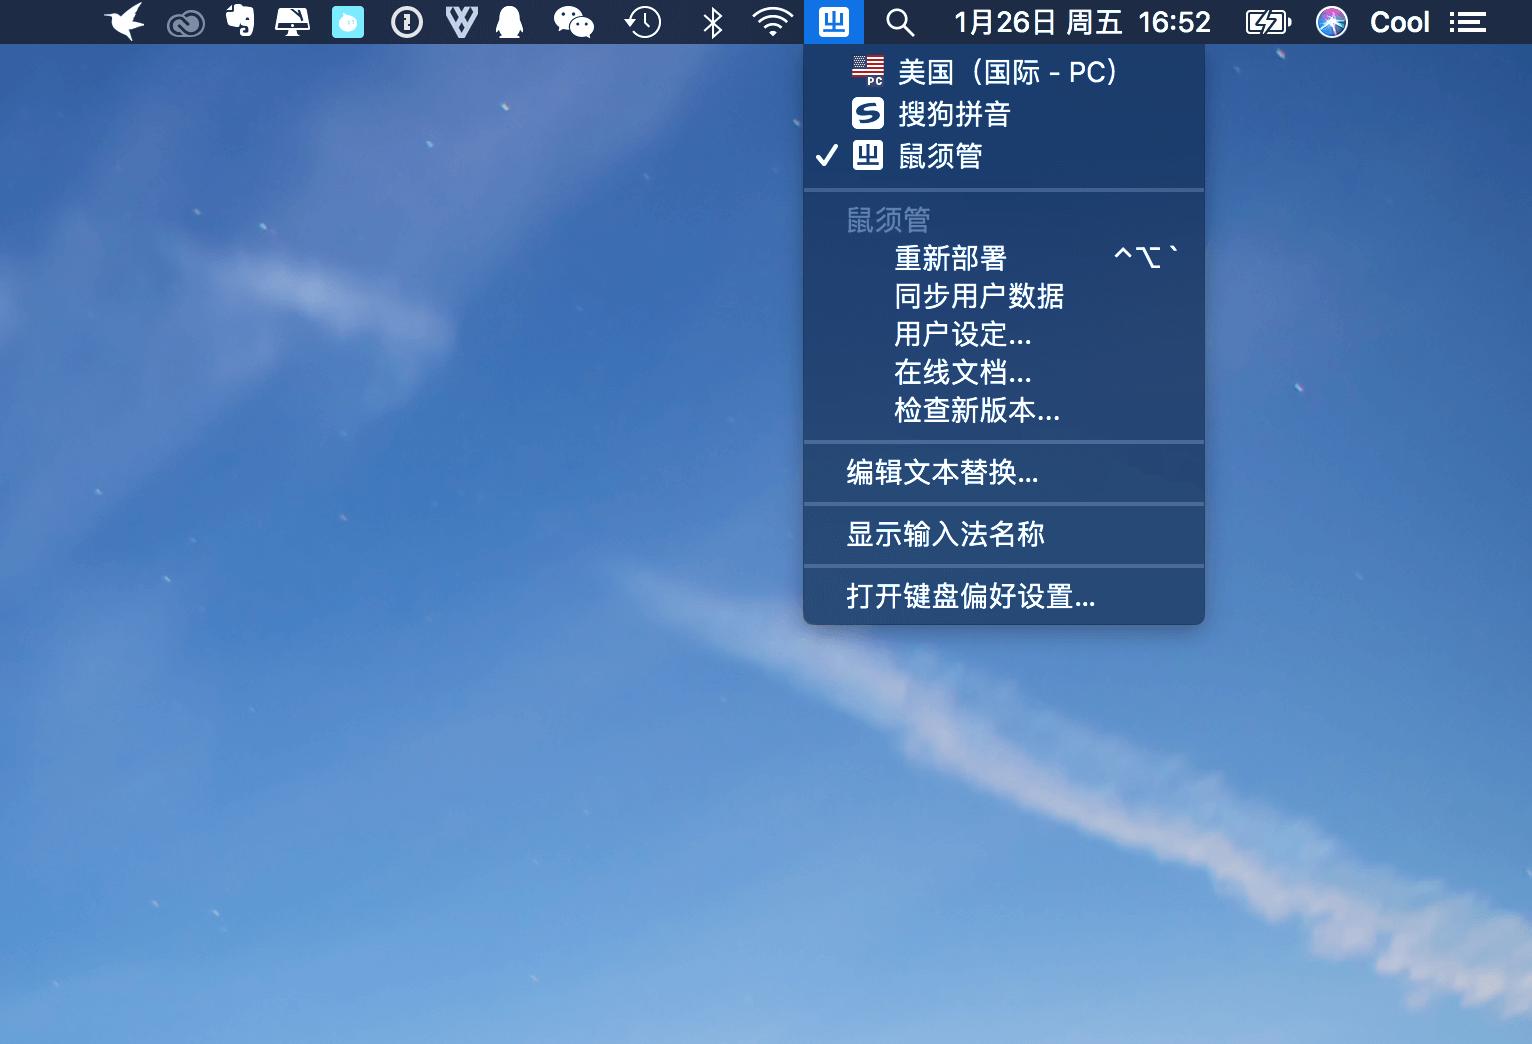 Squirrel 0.9.26.1超高人气神级输入法